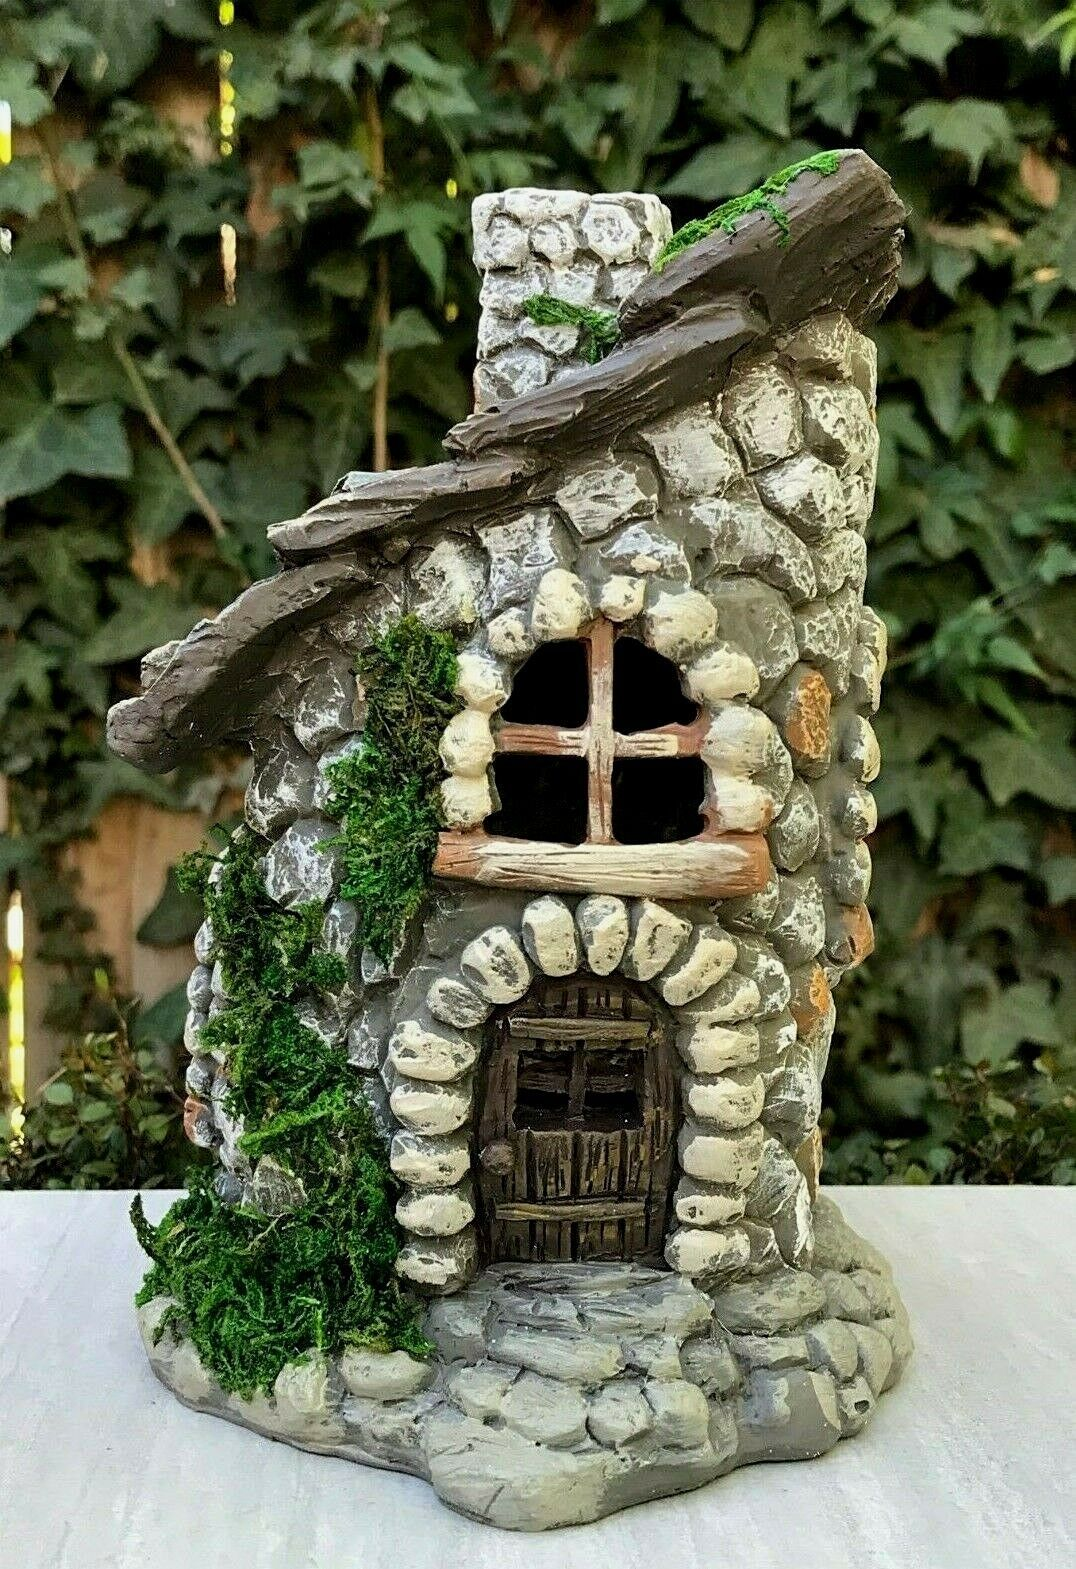 Miniature Dollhouse FAIRY GARDEN Figurine ~ Stone Look Cottage House with Moss